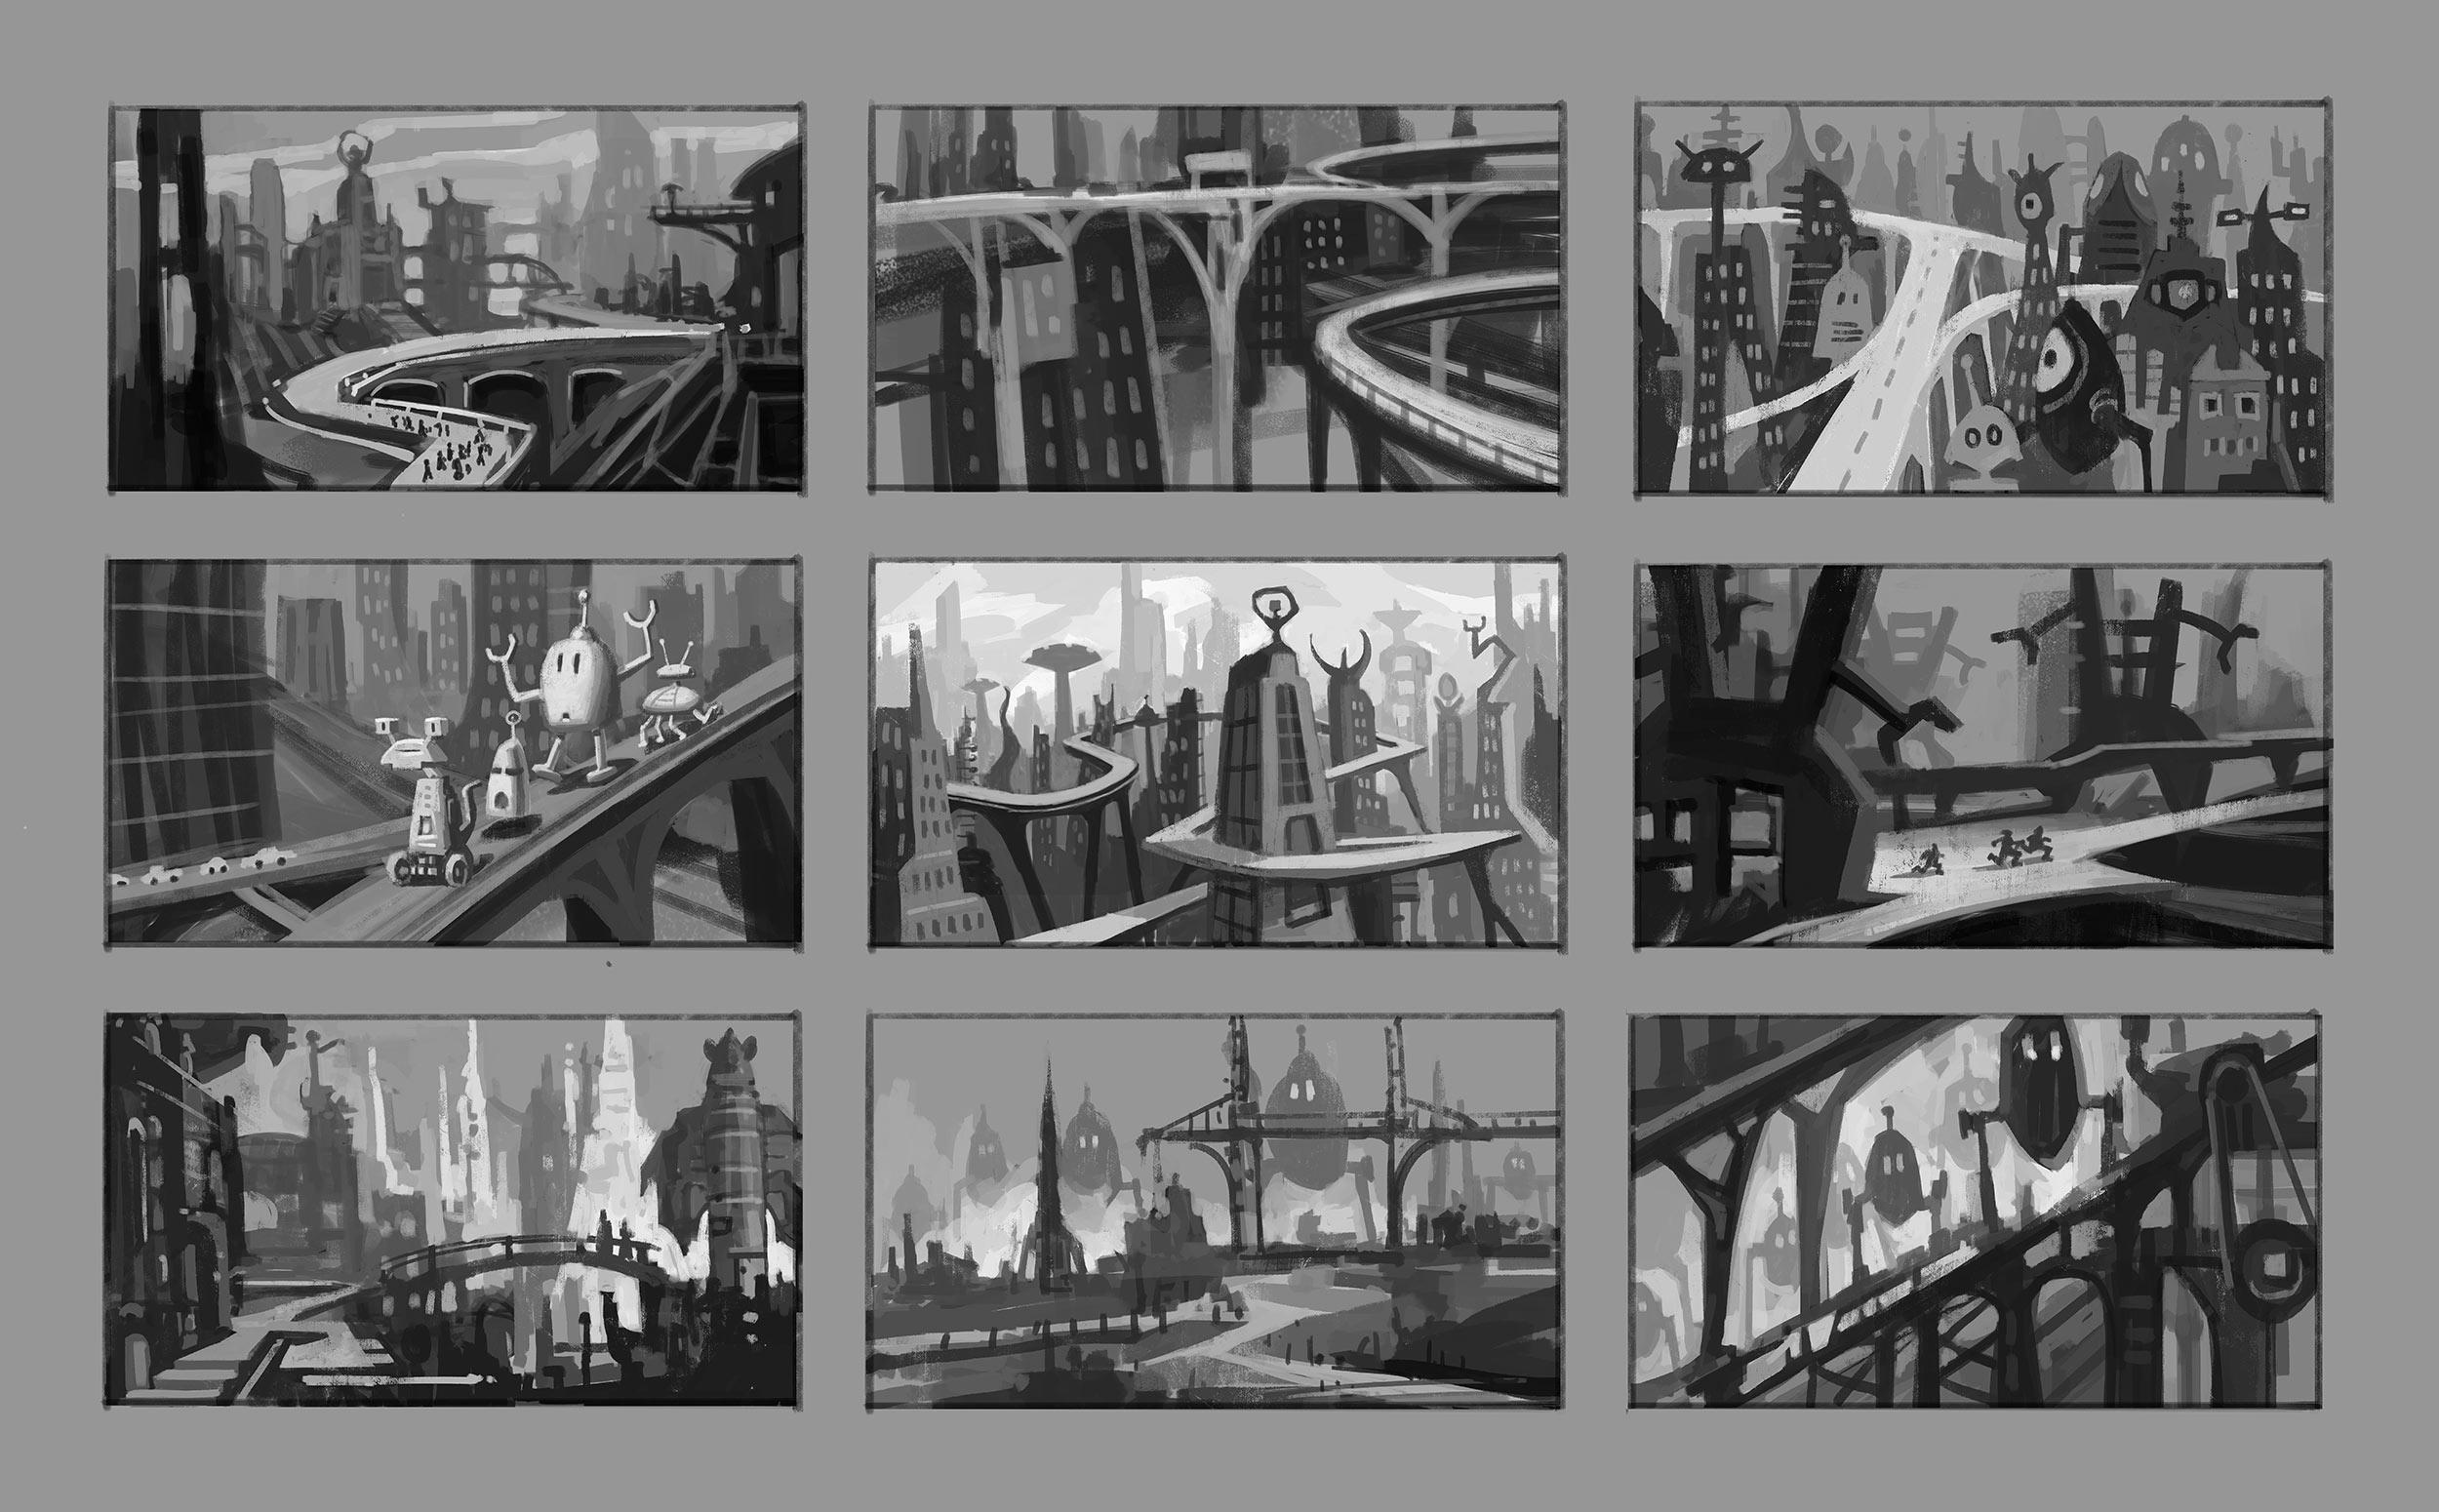 Robot_City_Thumbnails.jpg